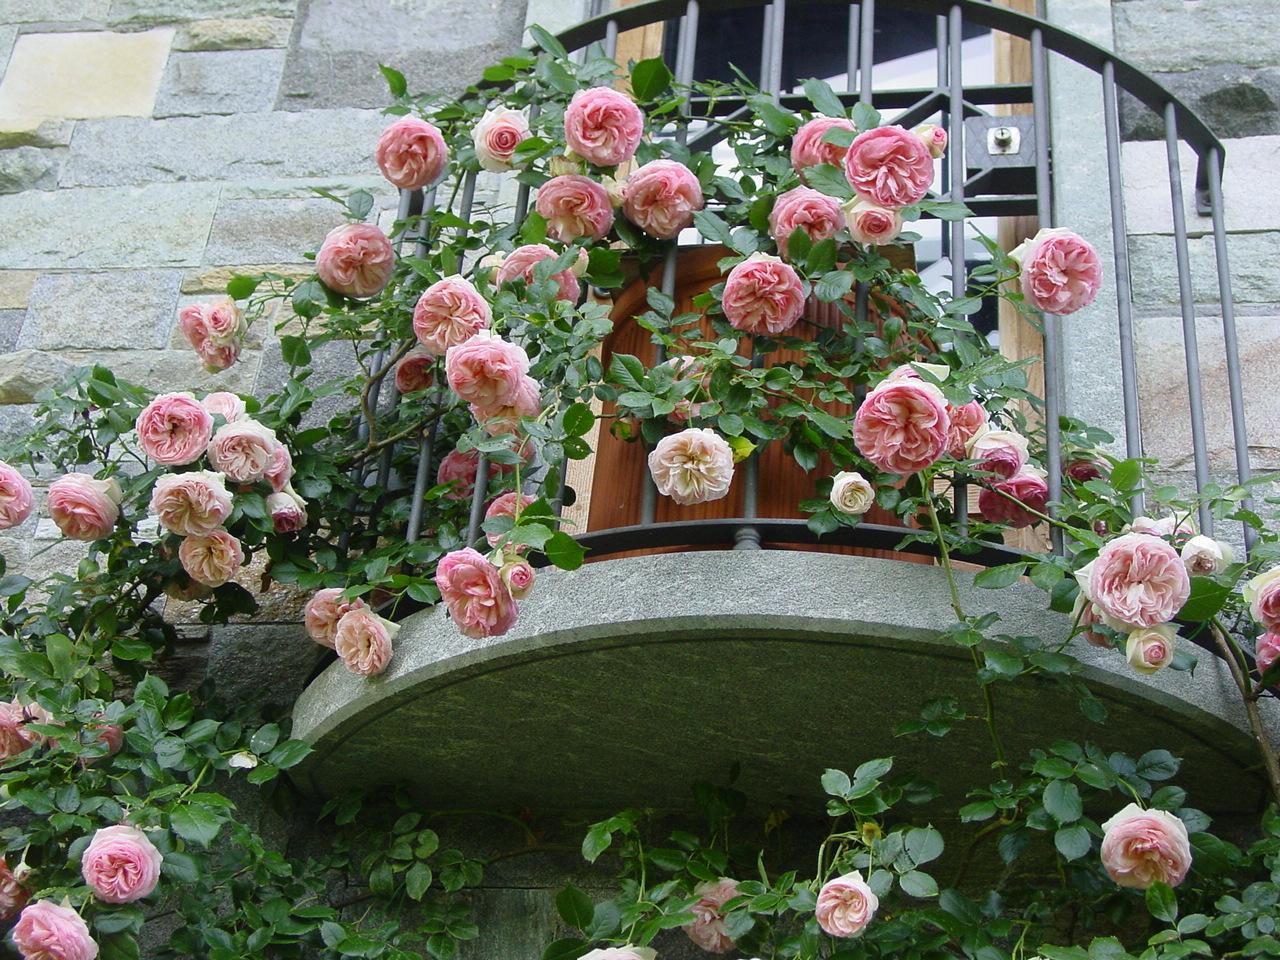 Rosedelizioseshabbychic pierre de ronsard for Pierre de ronsard rosa